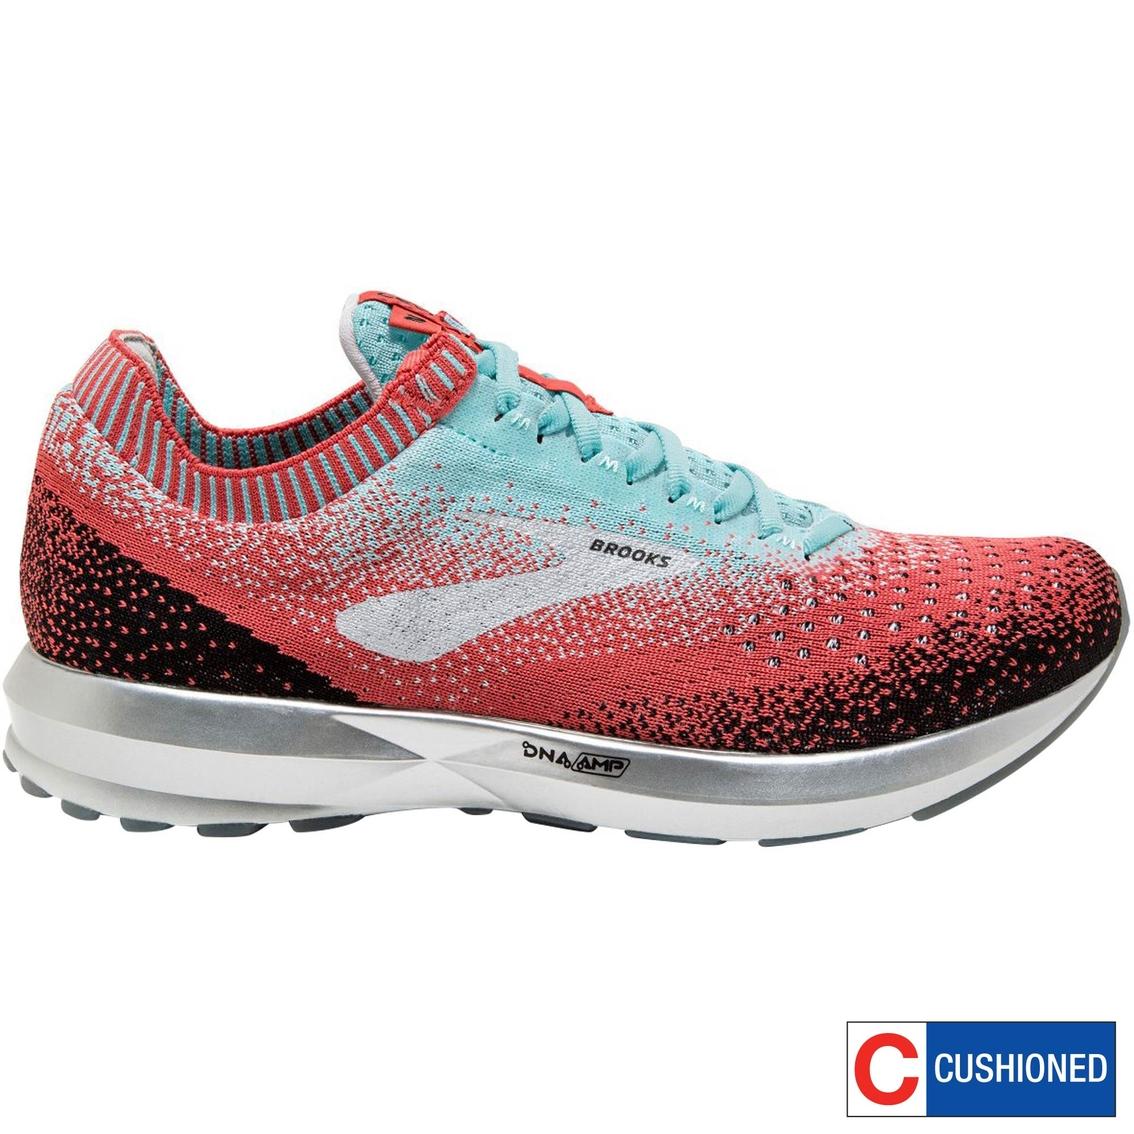 68c8b3ede1131 Brooks Women s Levitate 2 Running Shoes